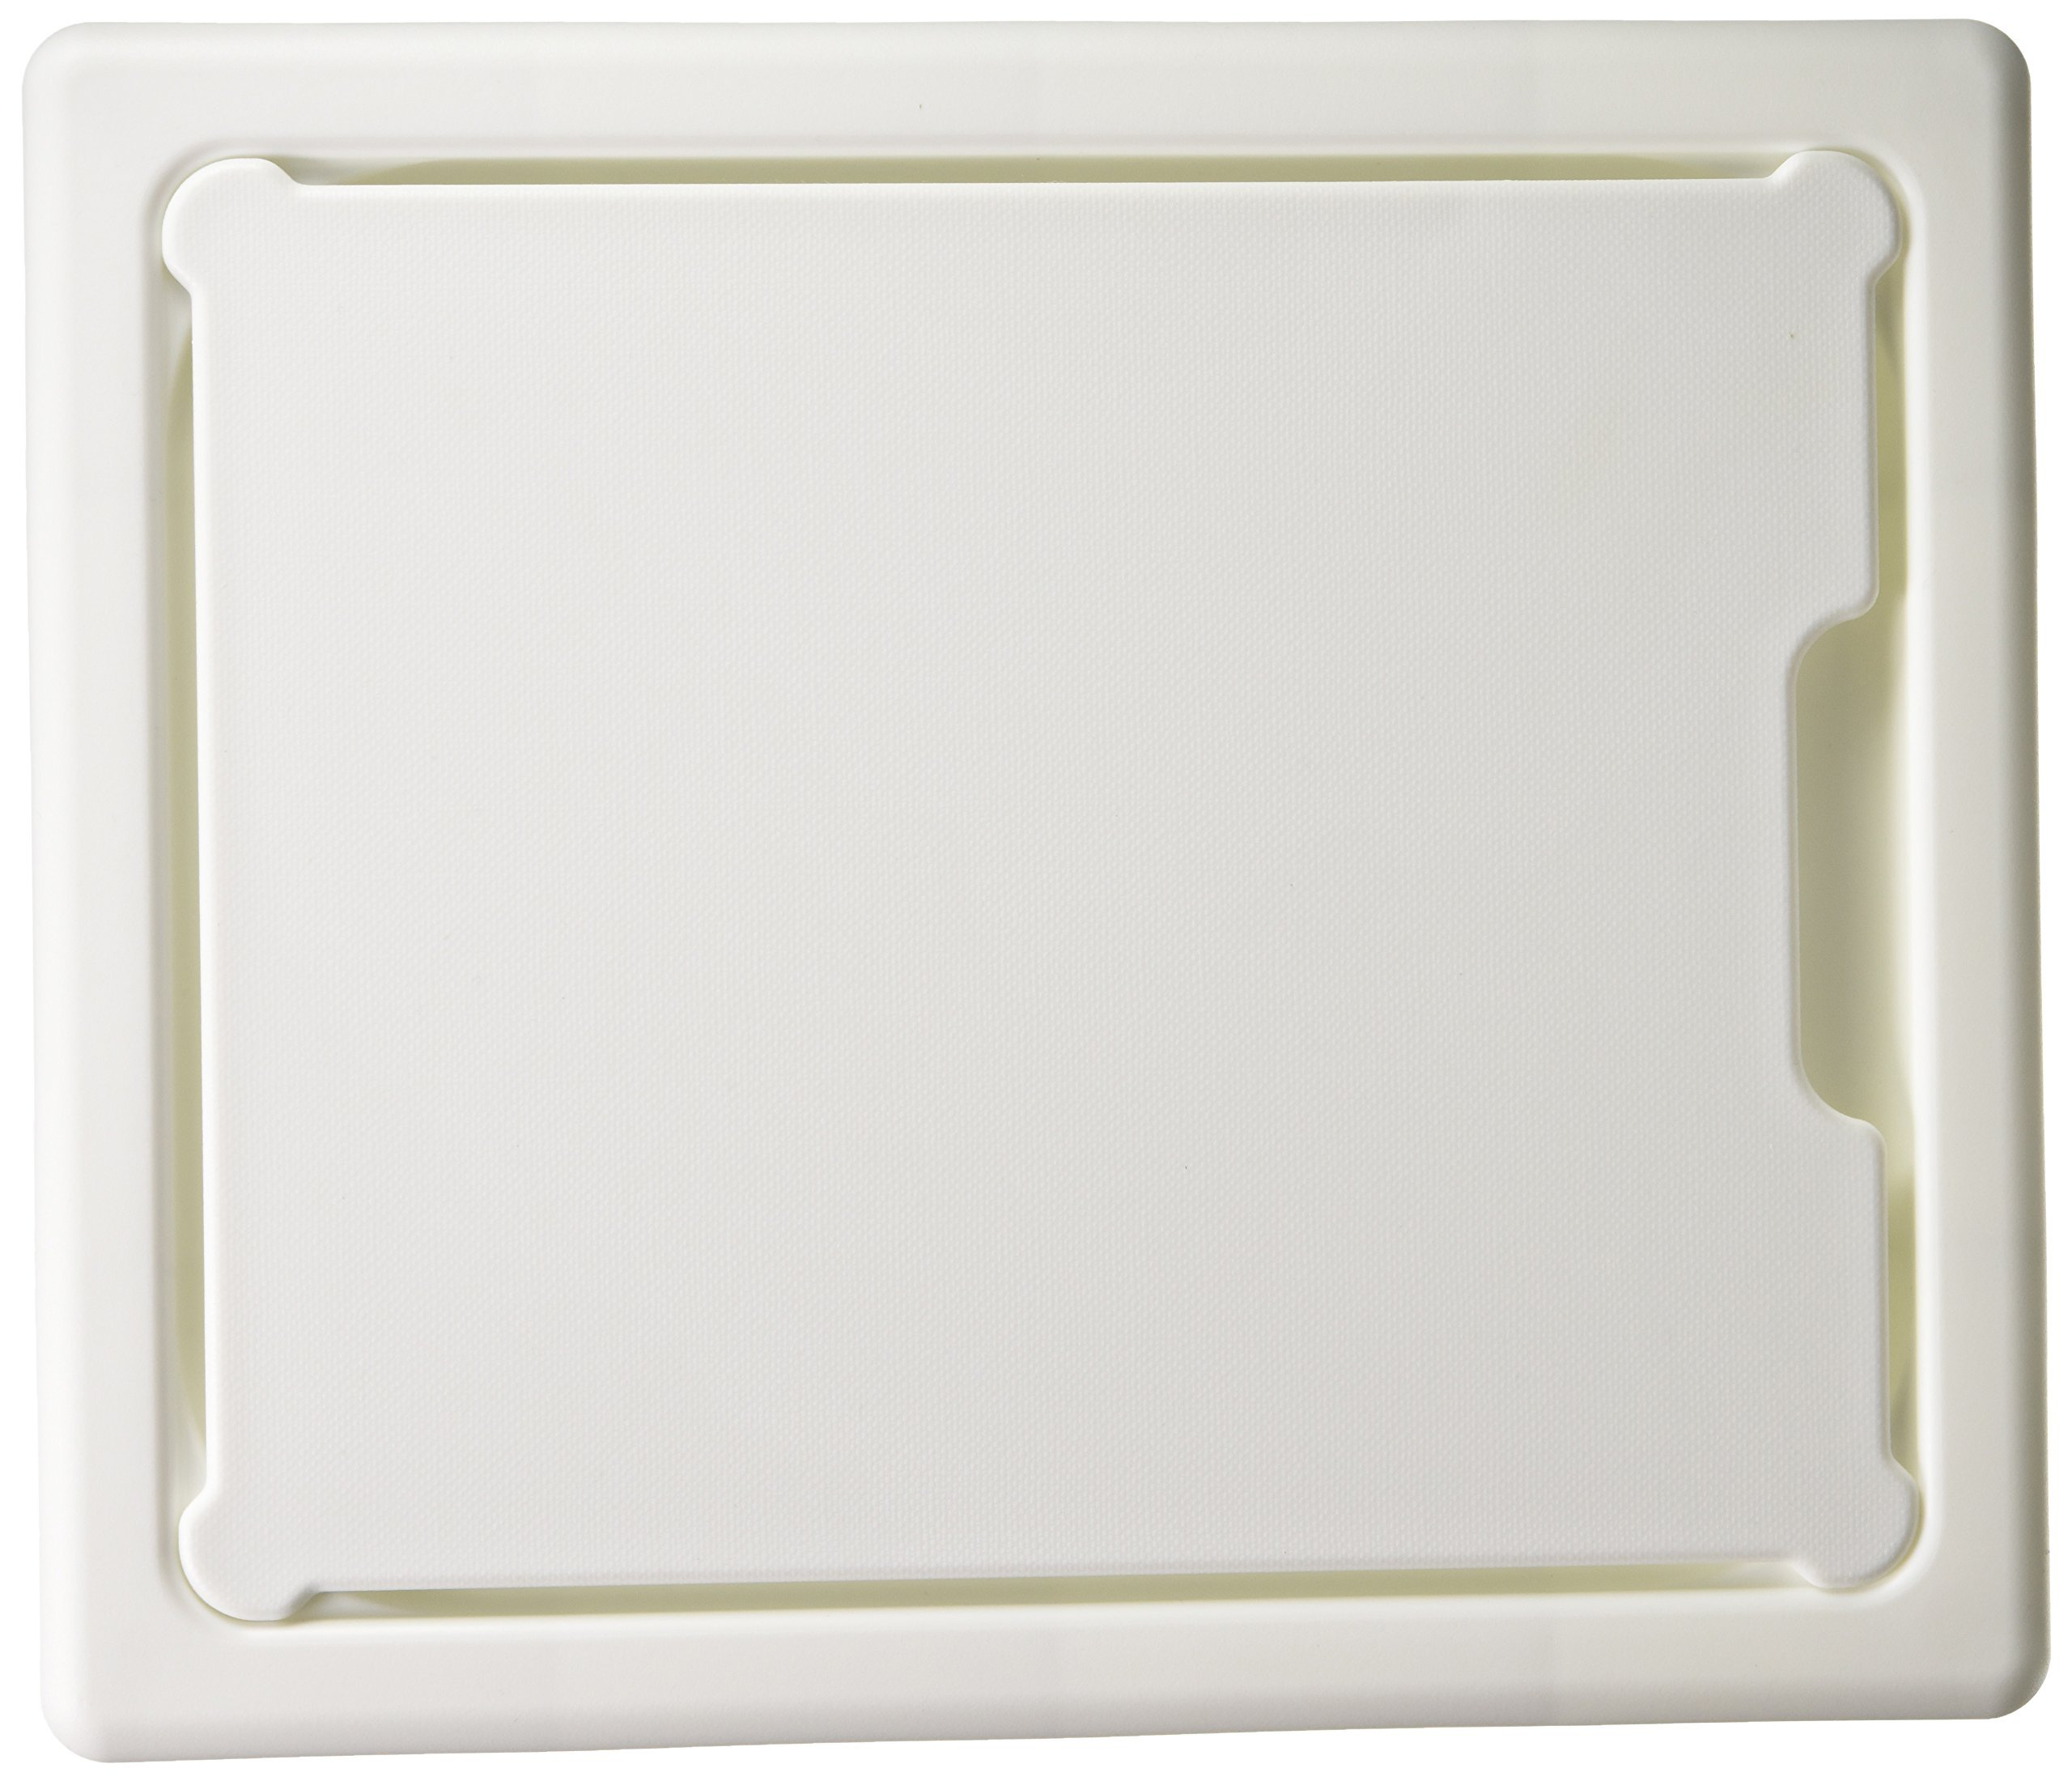 PerfectChop Cutting Board by Kitchen Advance